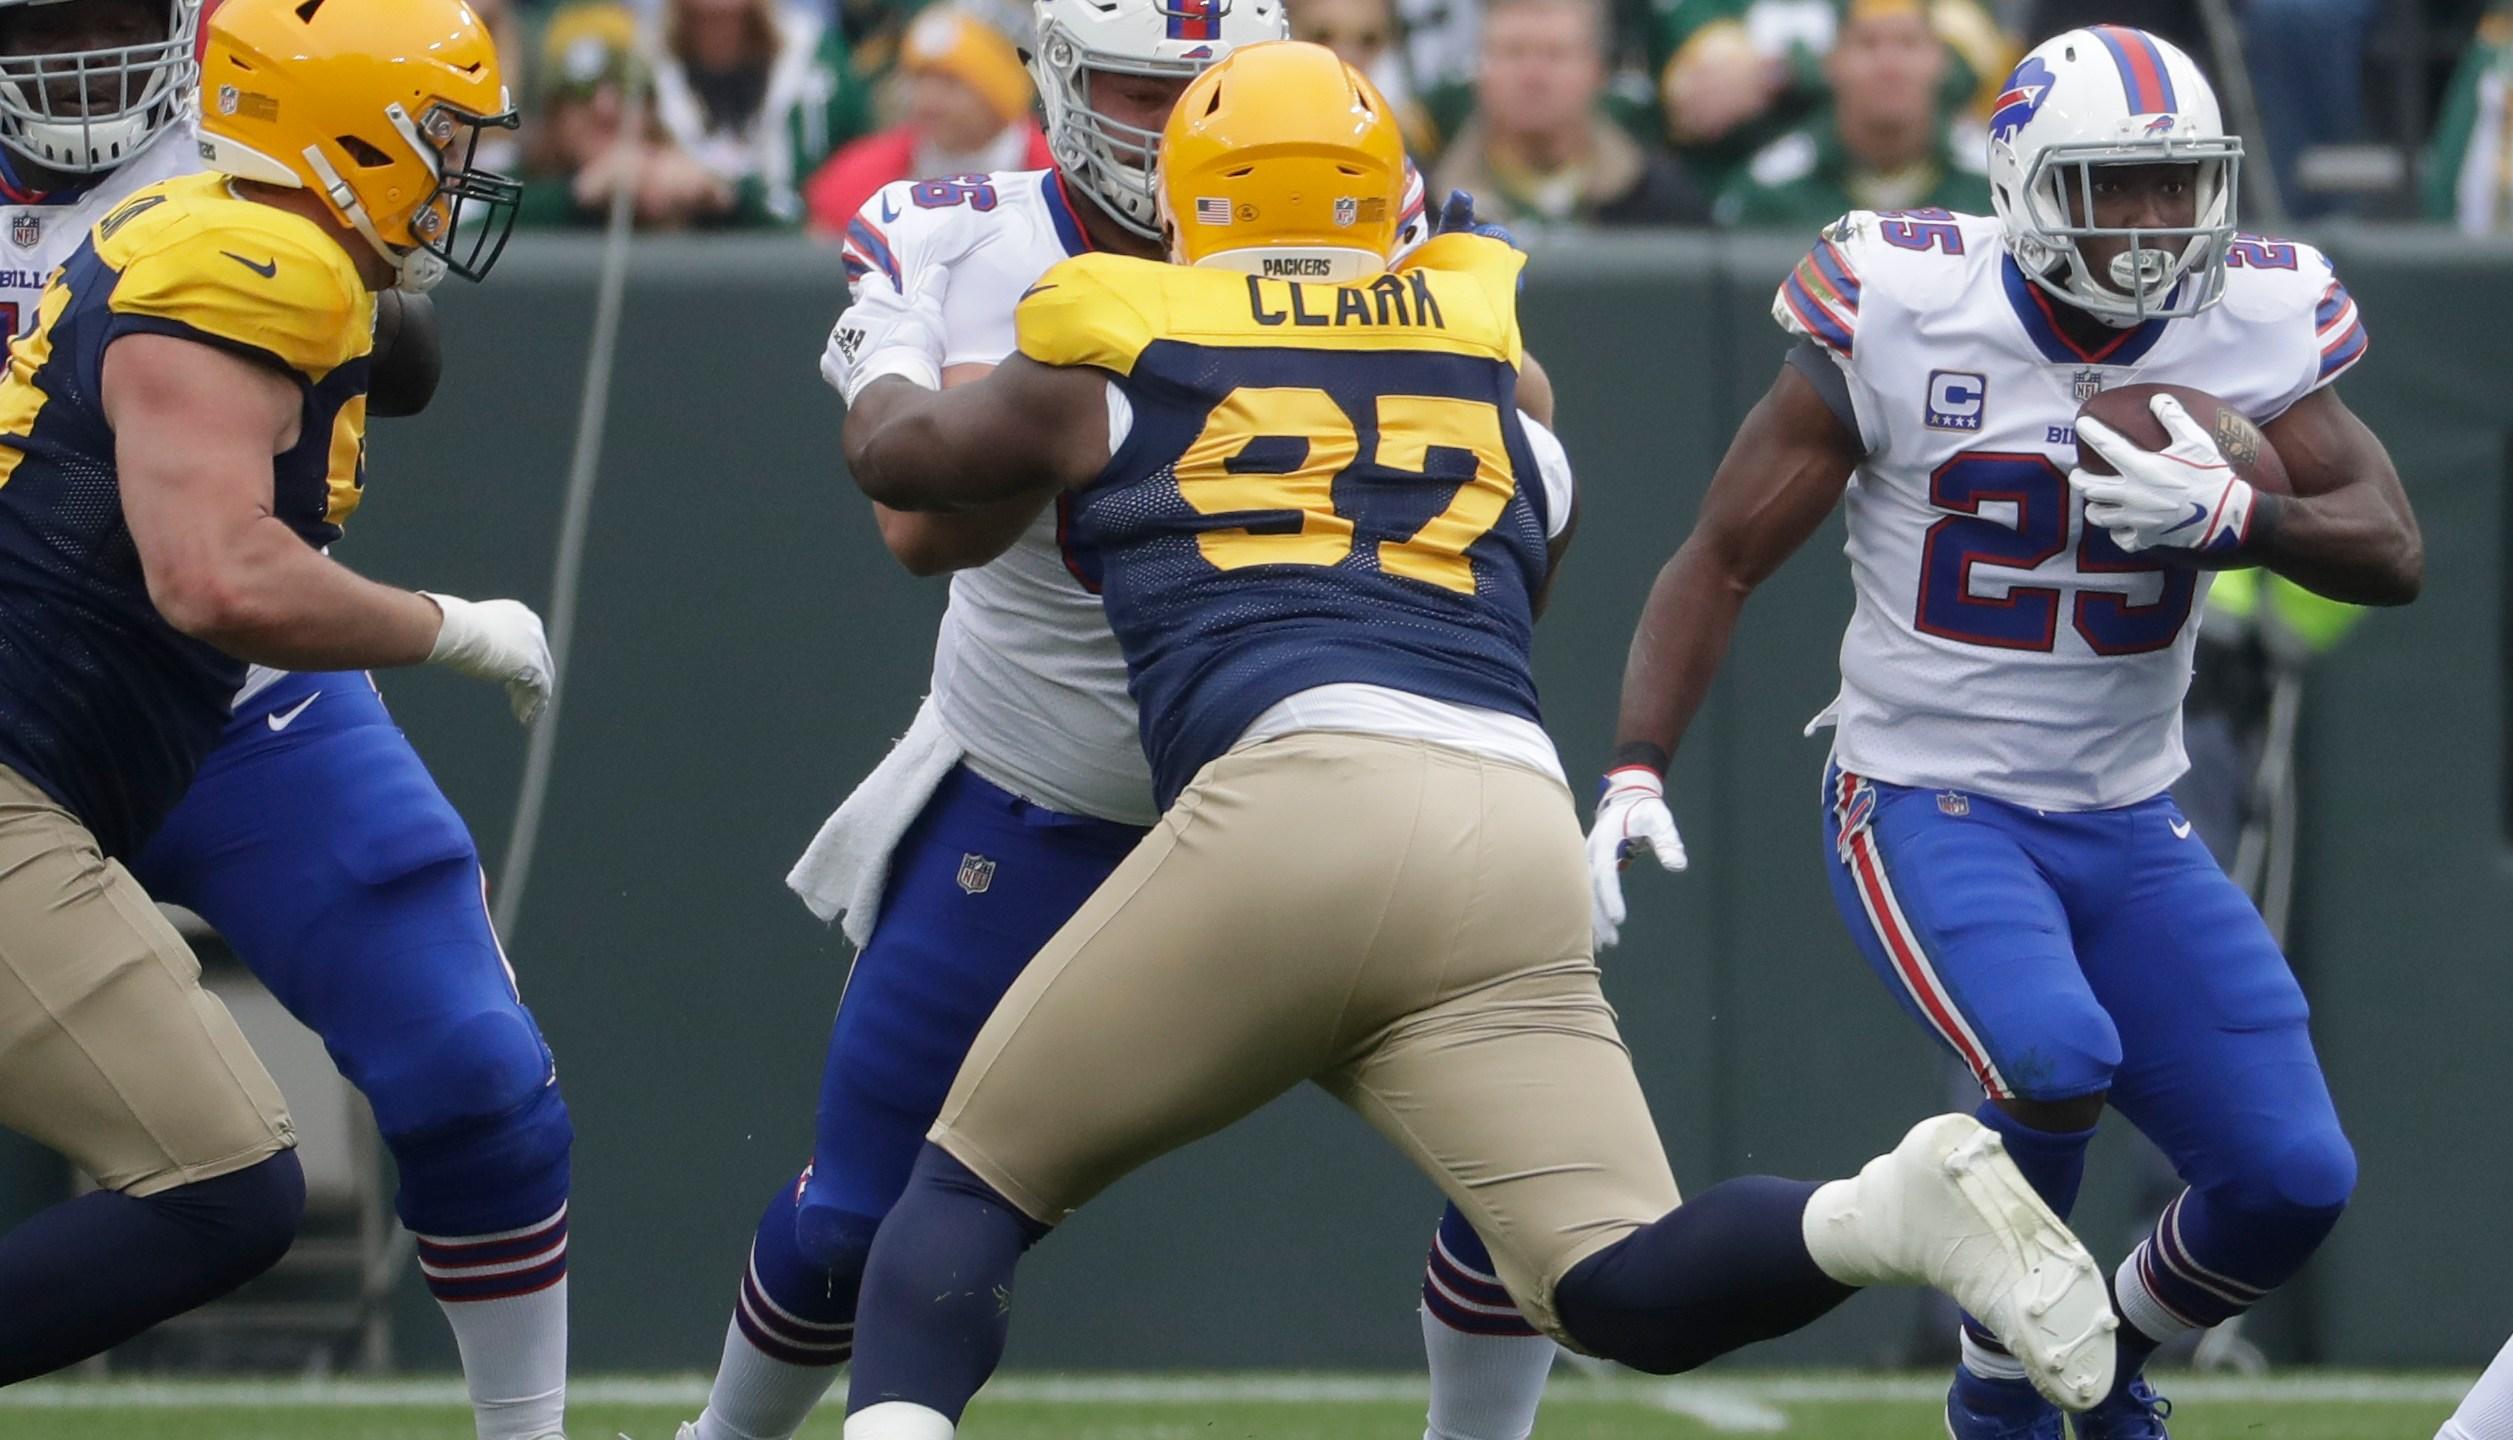 Bills Packers Football_1538923117857